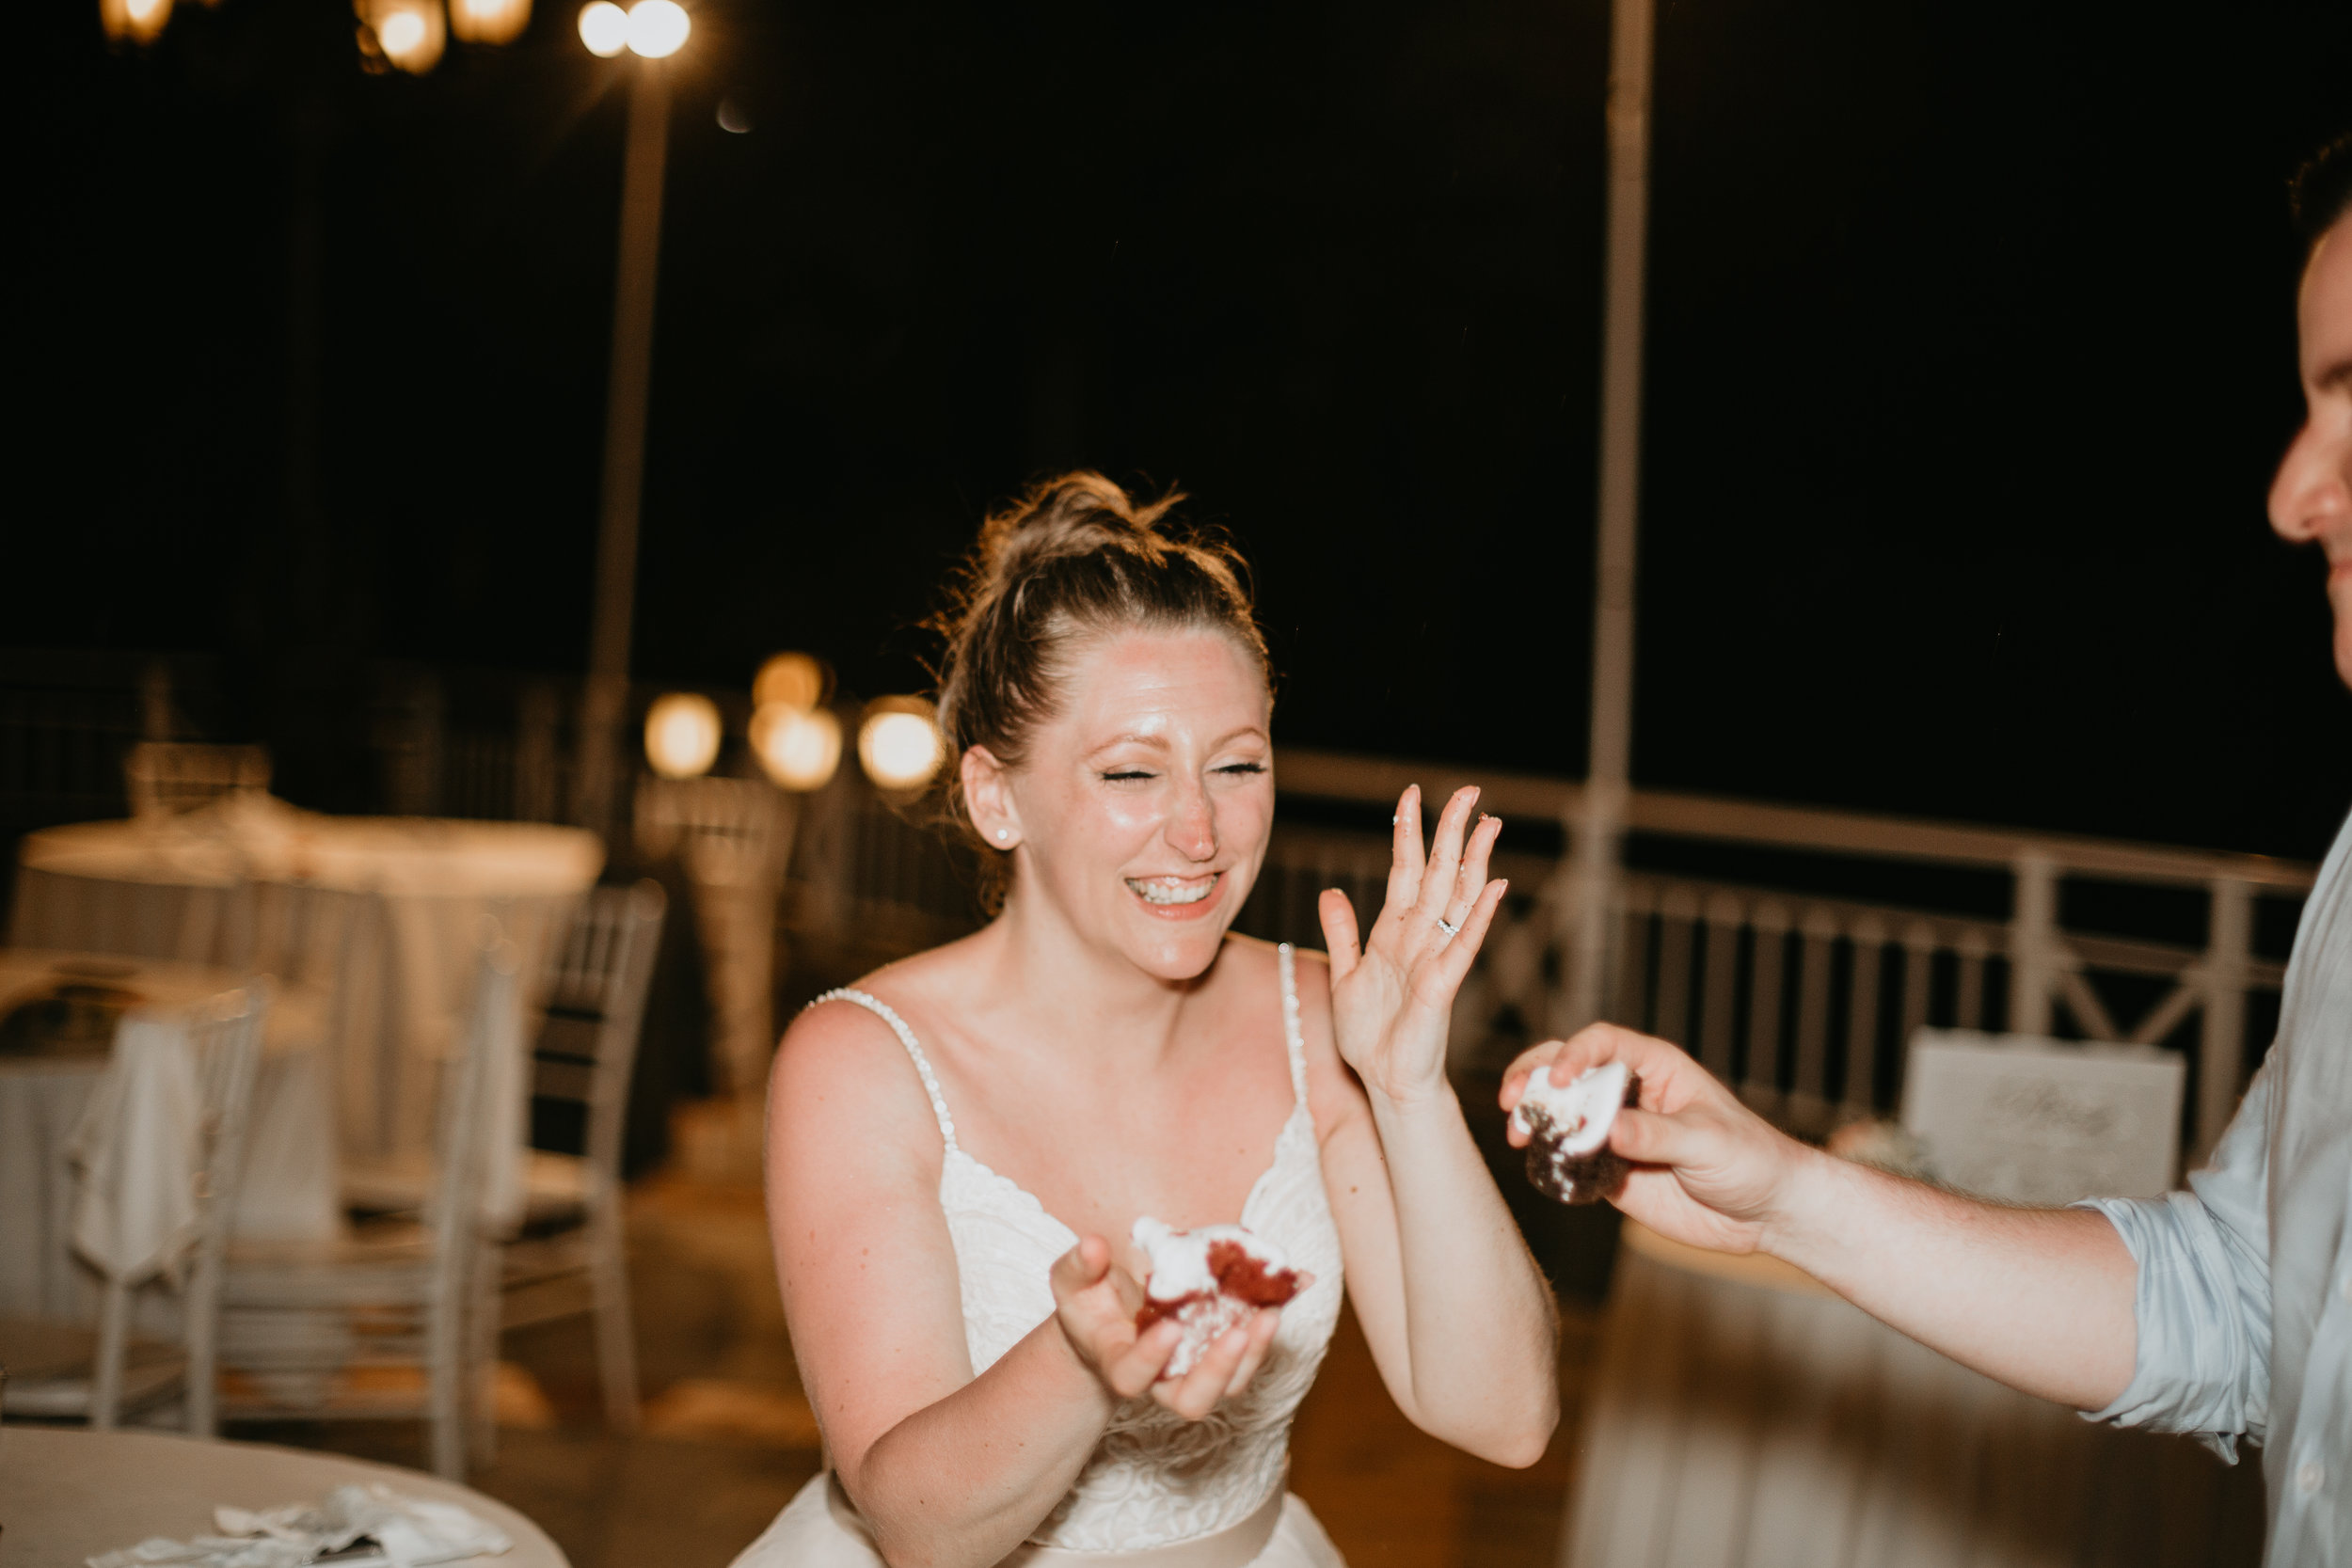 nicole-daacke-photography-destination-wedding-in-st-lucia-sandals-la-toc-intimate-island-wedding-carribean-elopement-photographer-chill-island-wedding-184.jpg